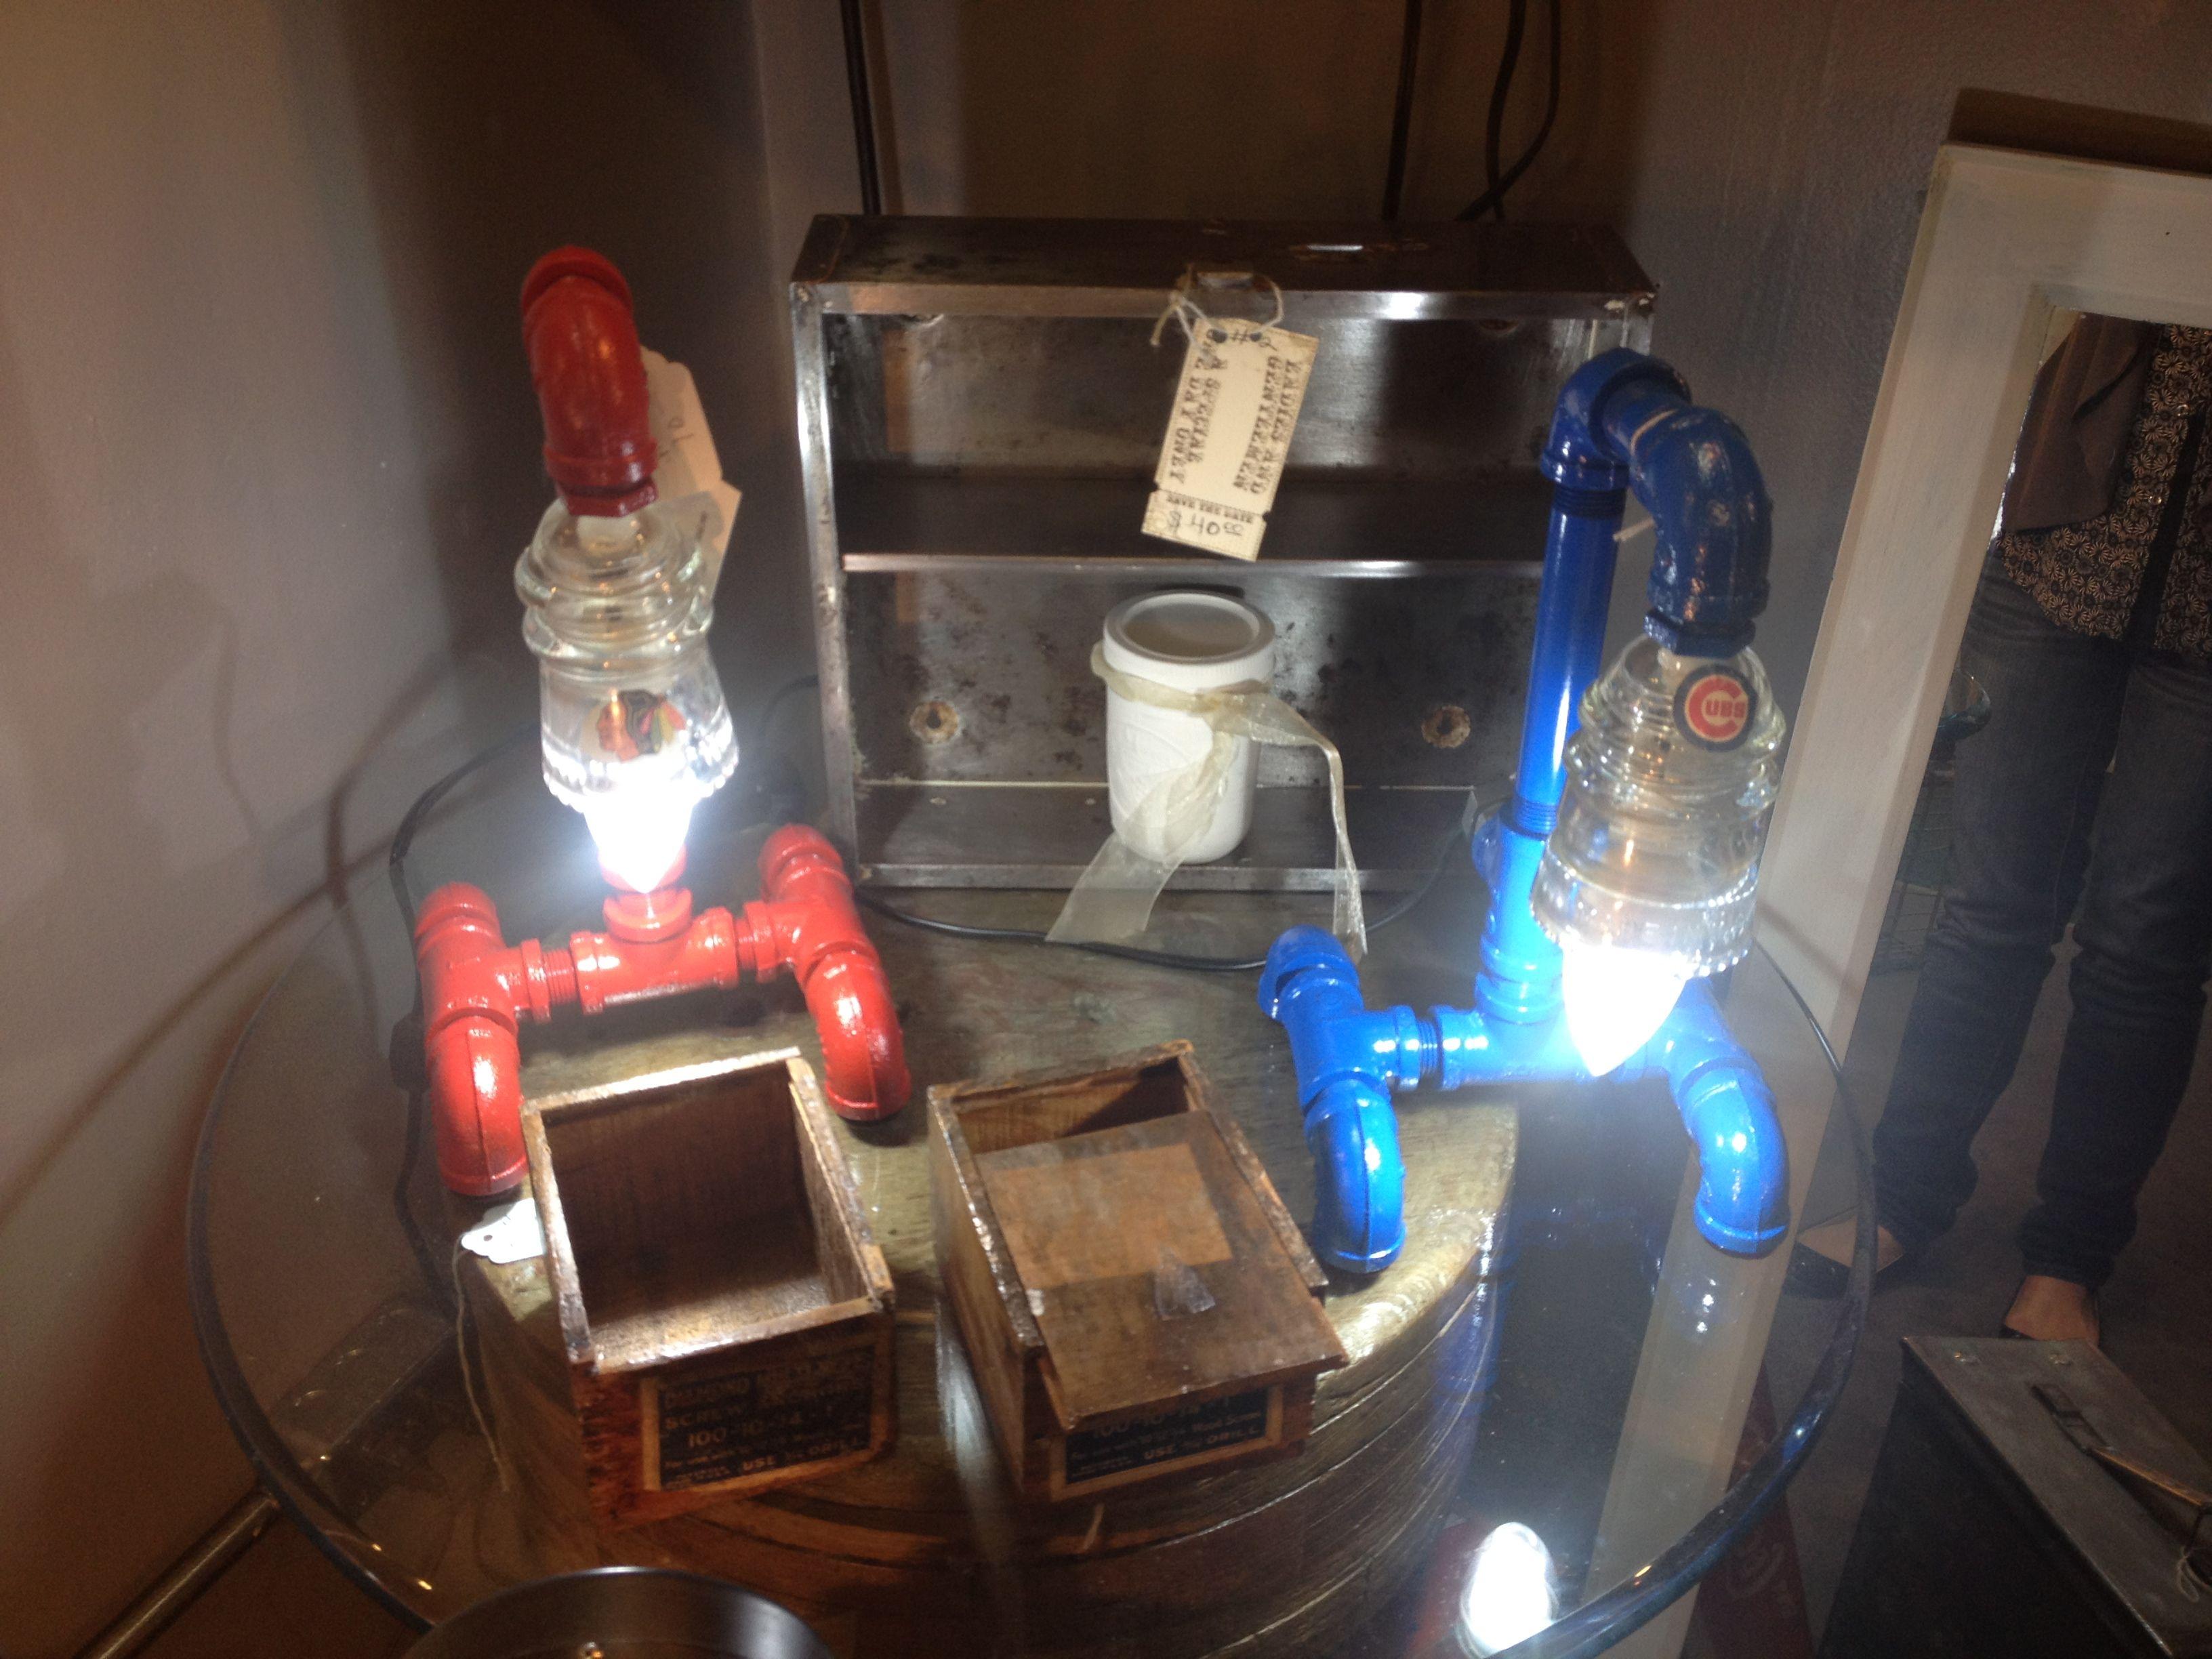 LED Chicago Team pipe / insulator lights